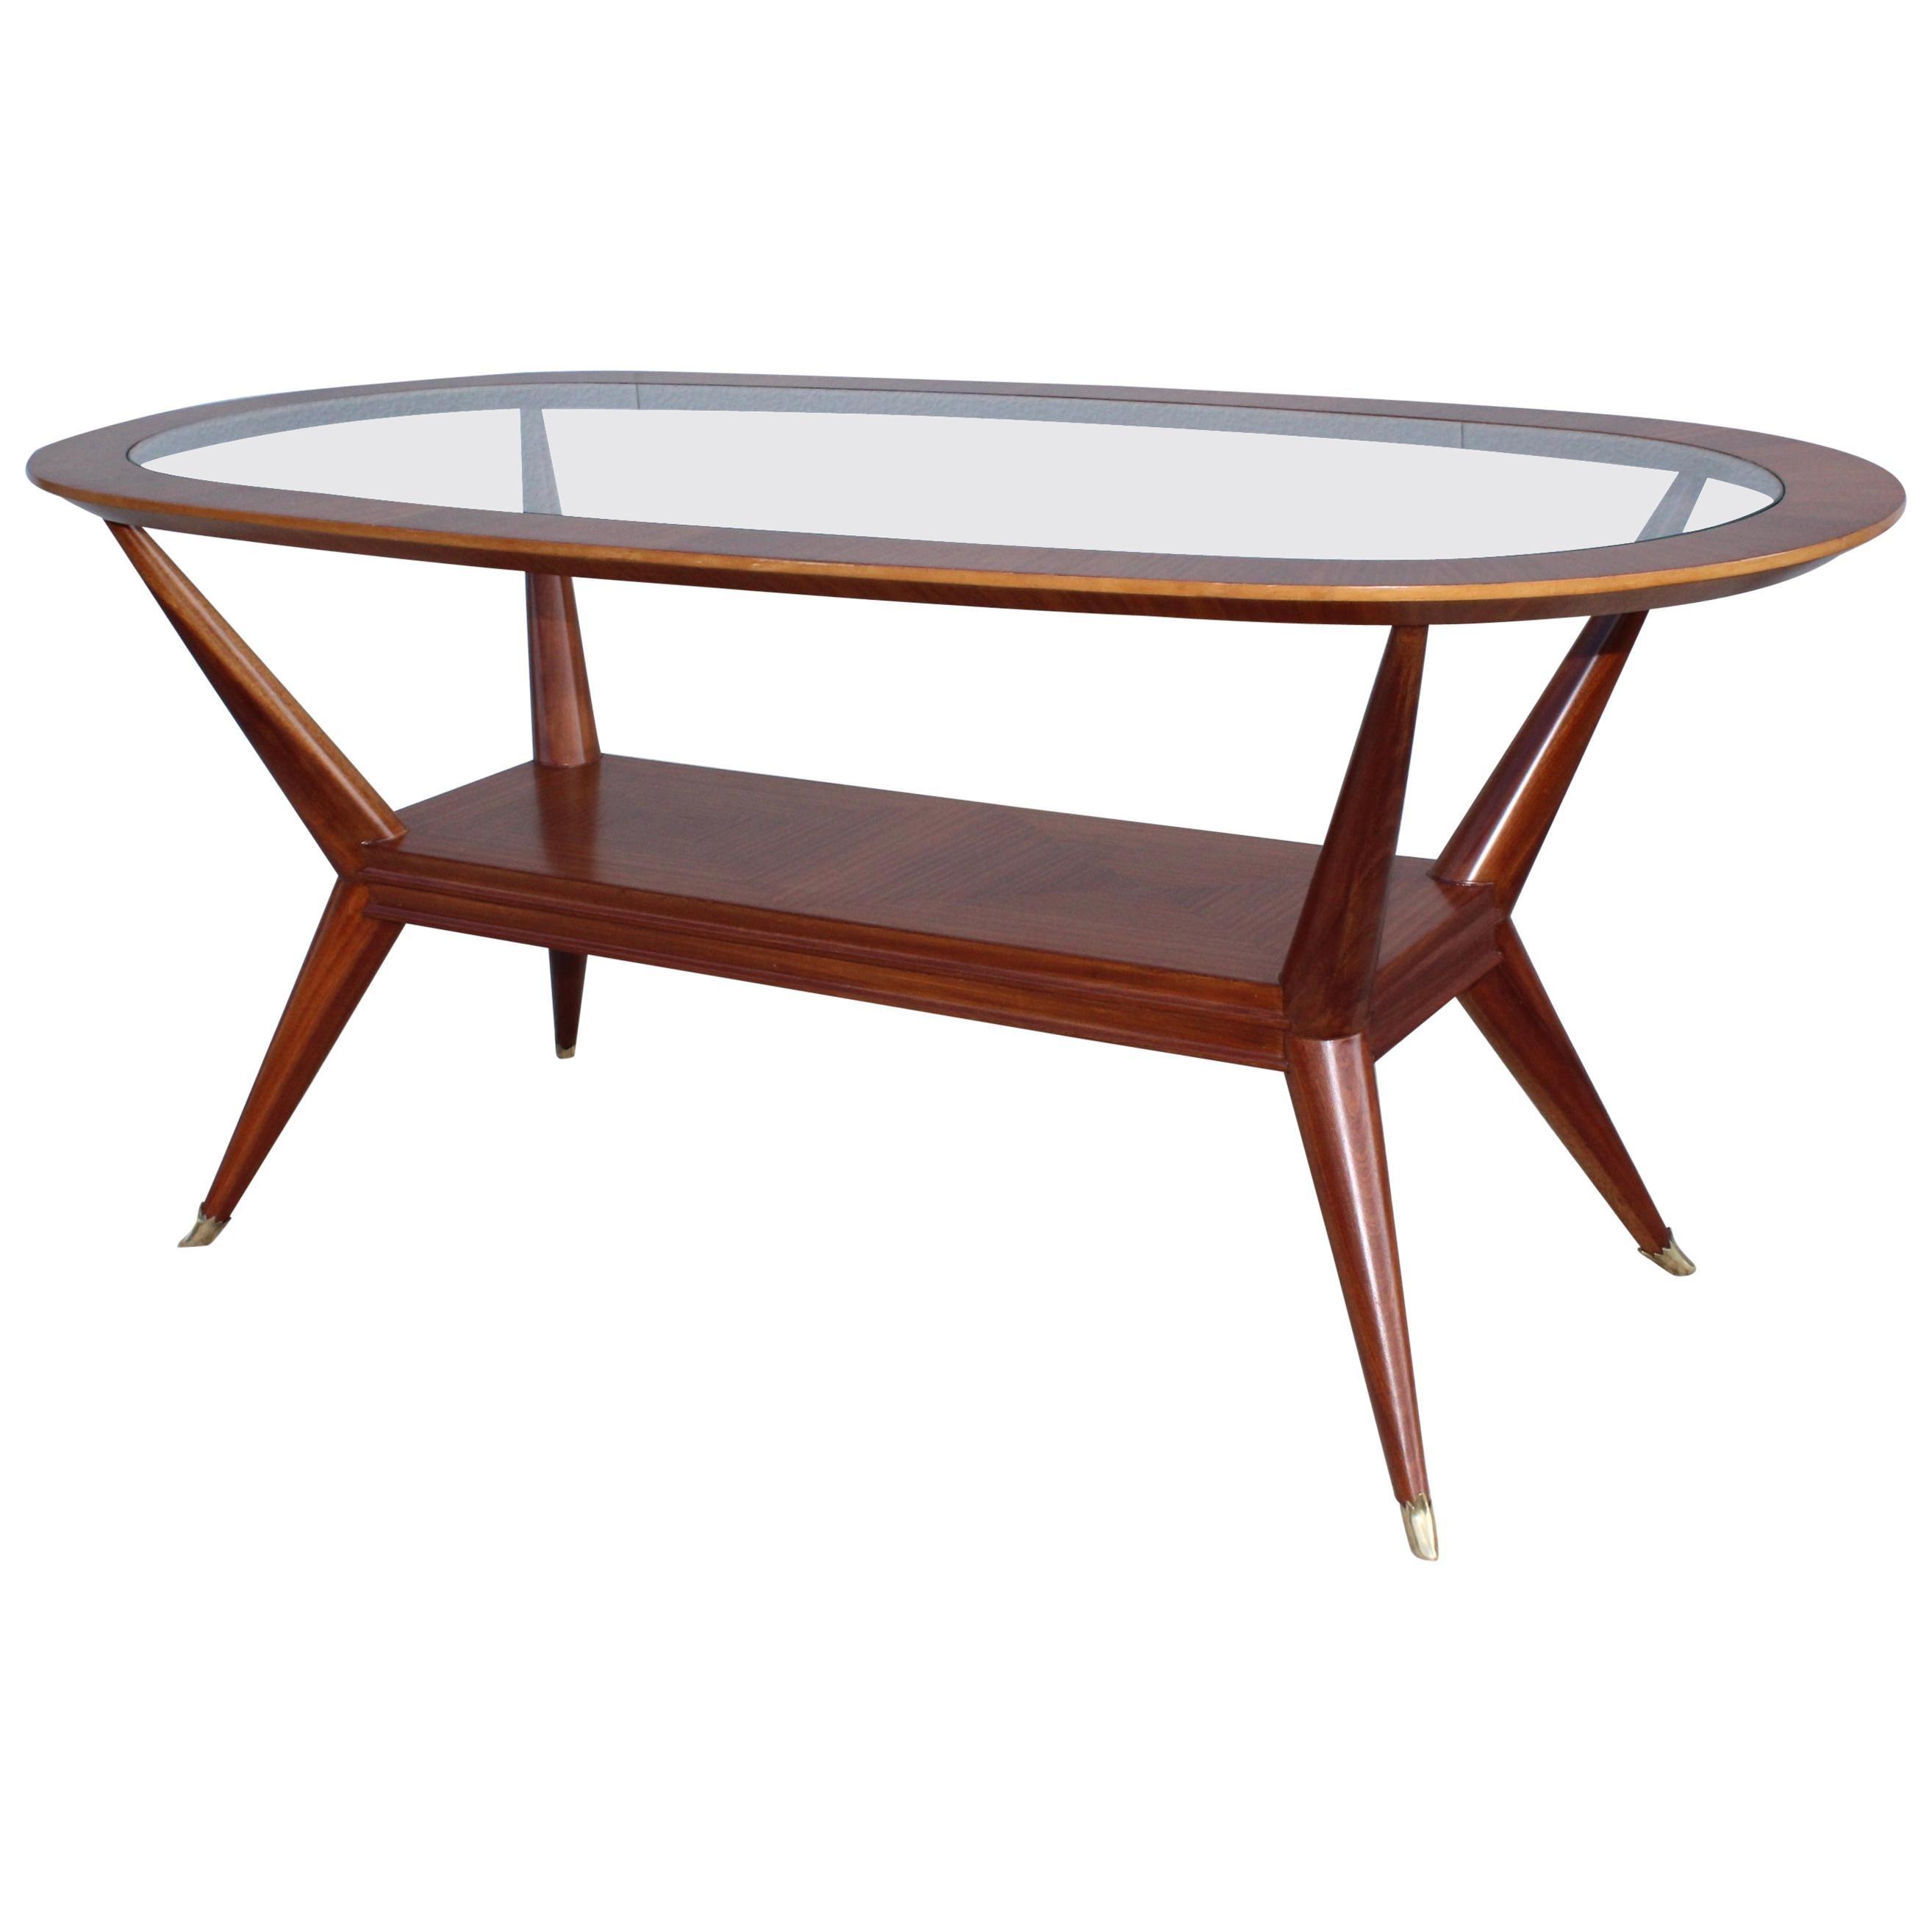 Vittorio Dassi Attributed Dining Table/Desk